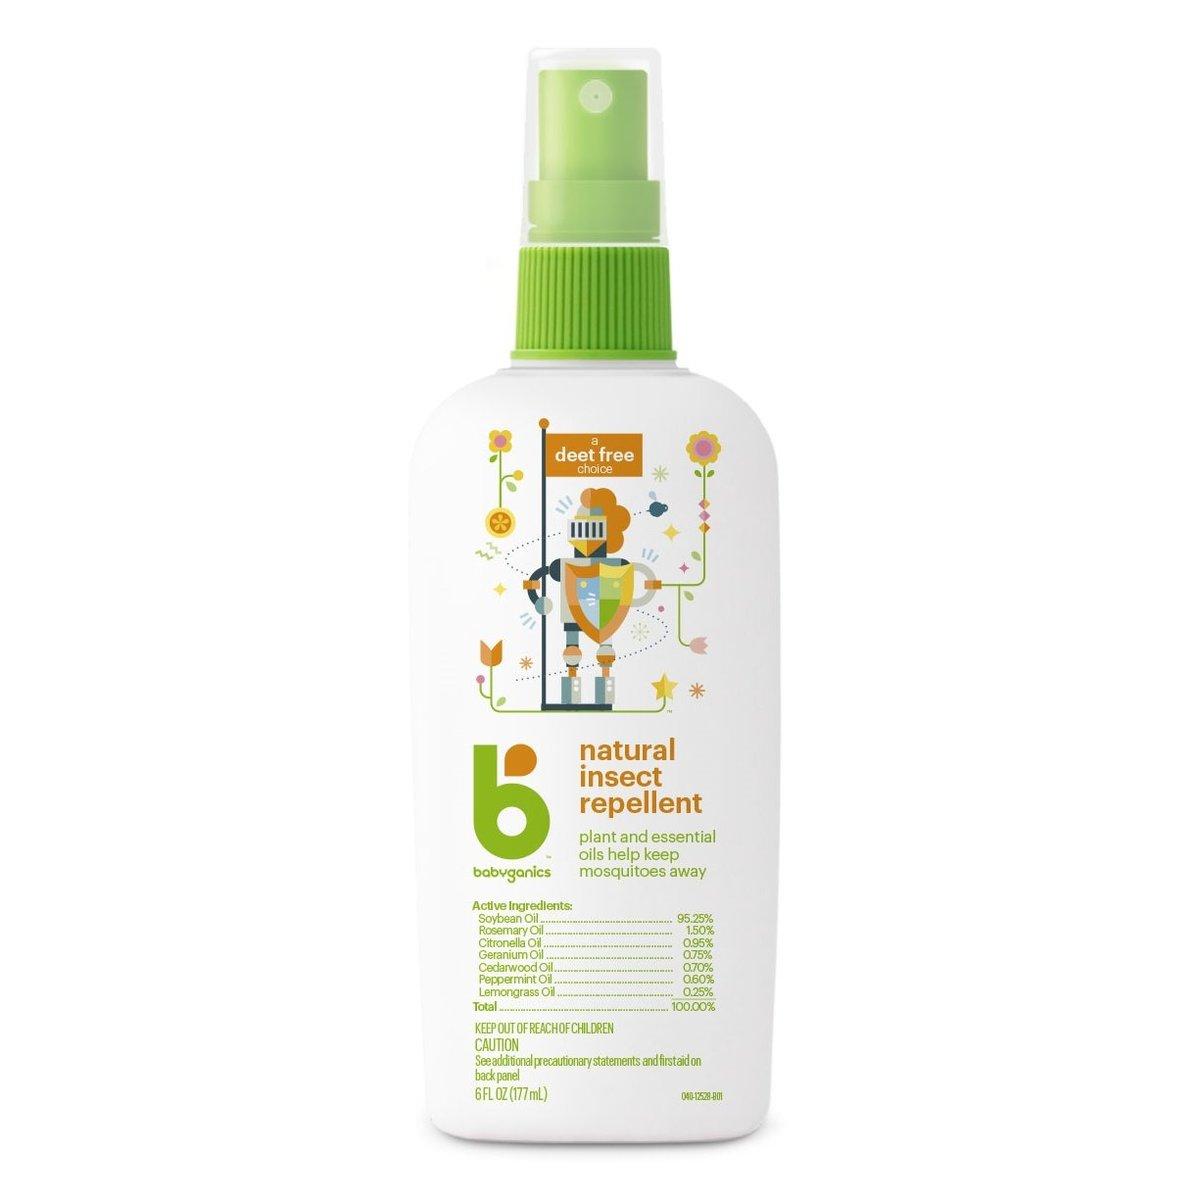 Natural Insect Repellent DEET-Free 6oz (Dealer Goods)